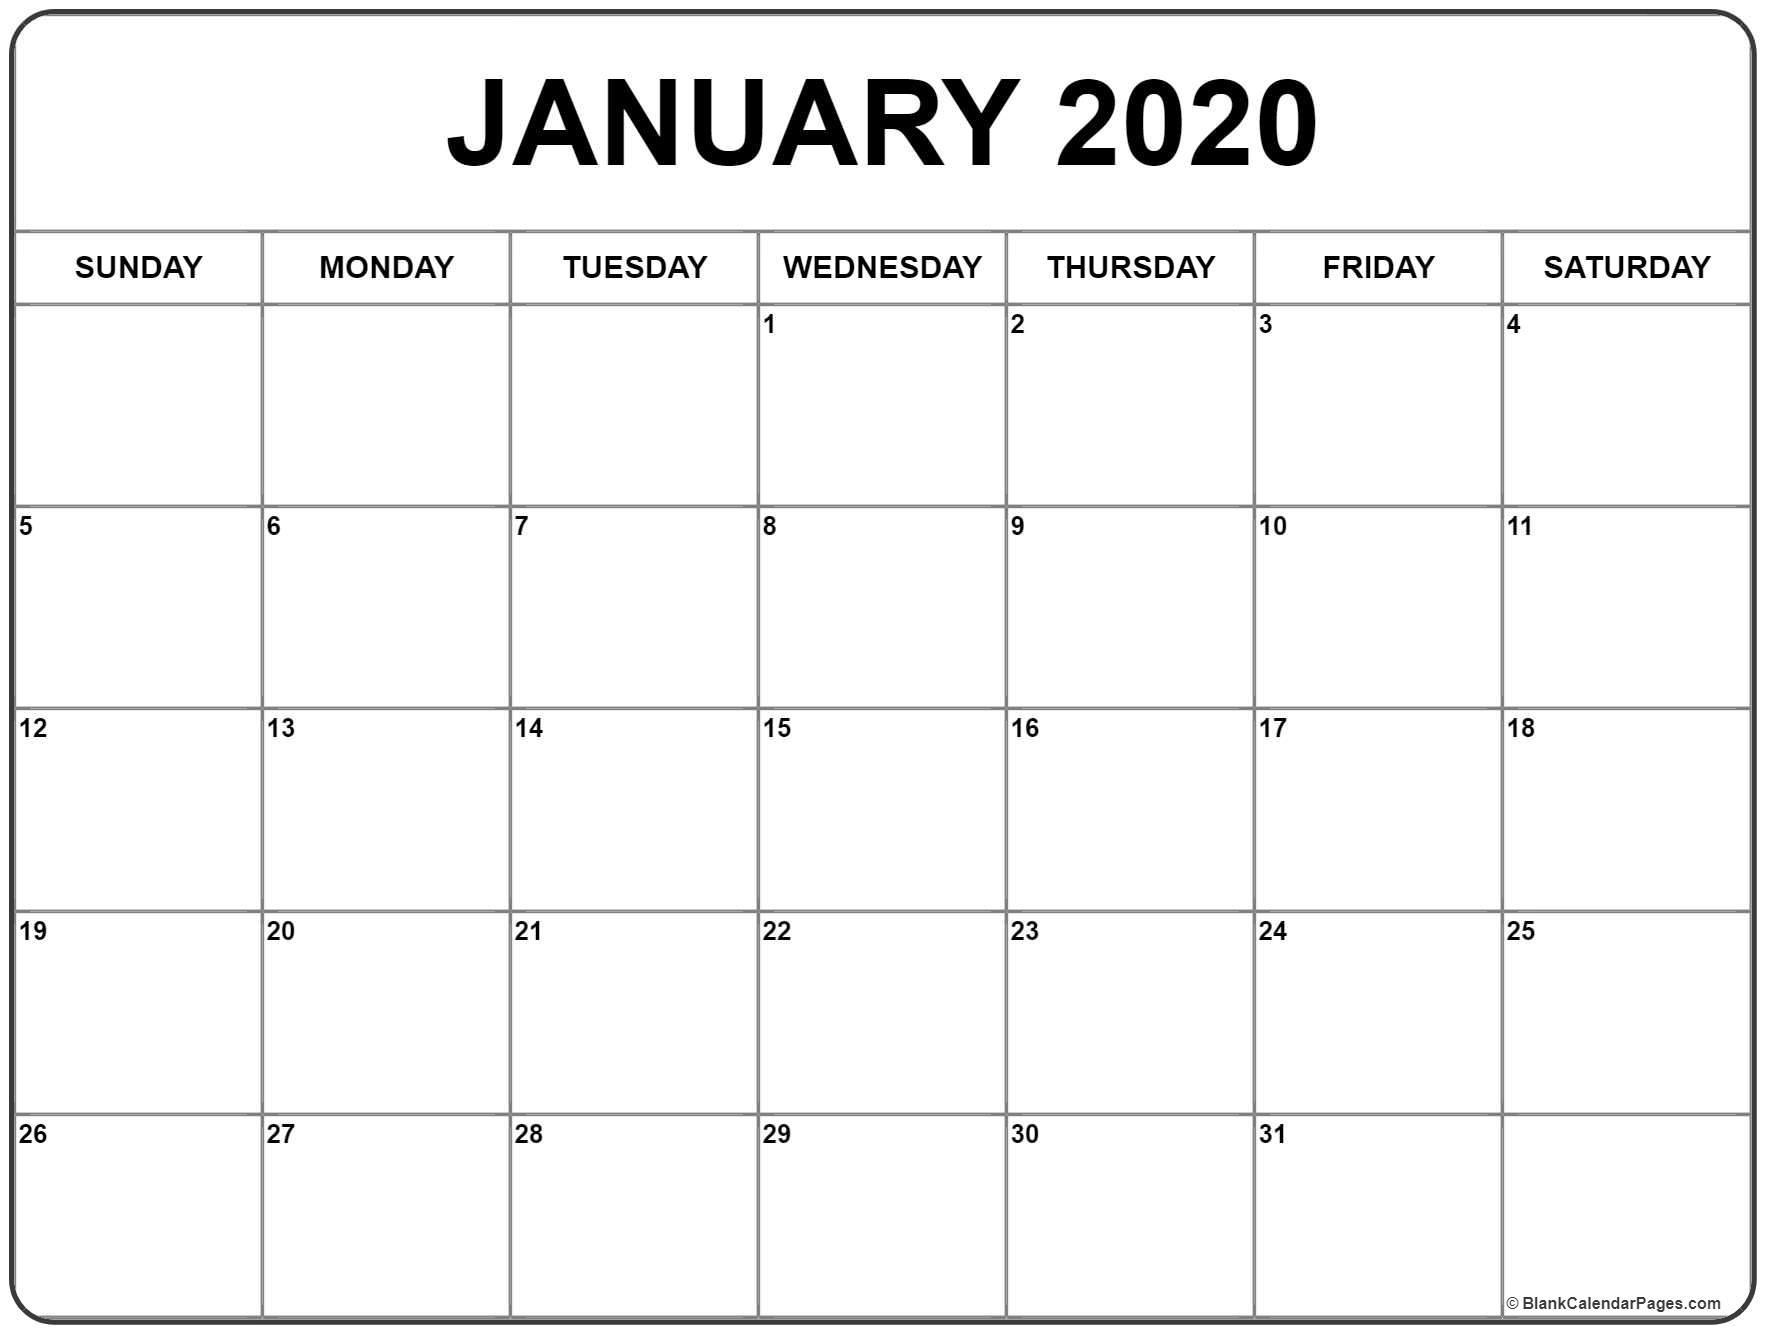 January 2020 Calendar | Free Printable Monthly Calendars within Printable 2020 Calendar